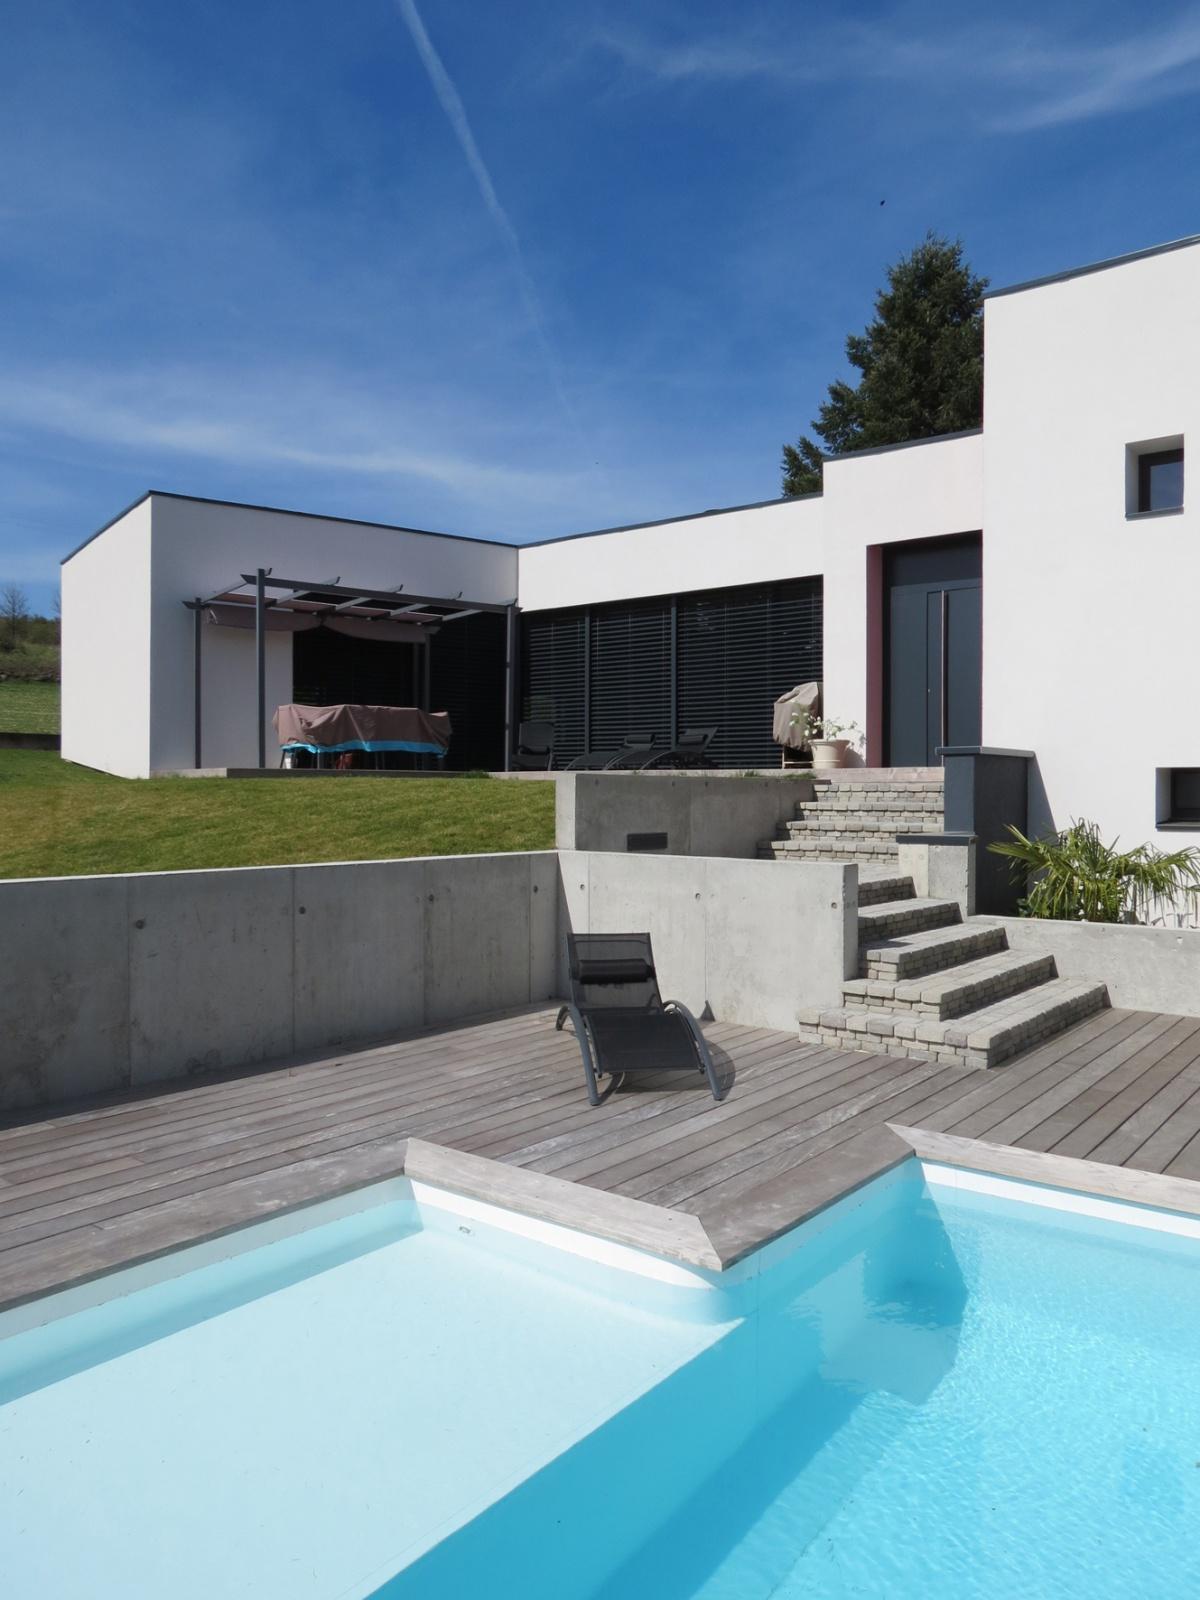 Maison contemporaine : IMG_1789 copie